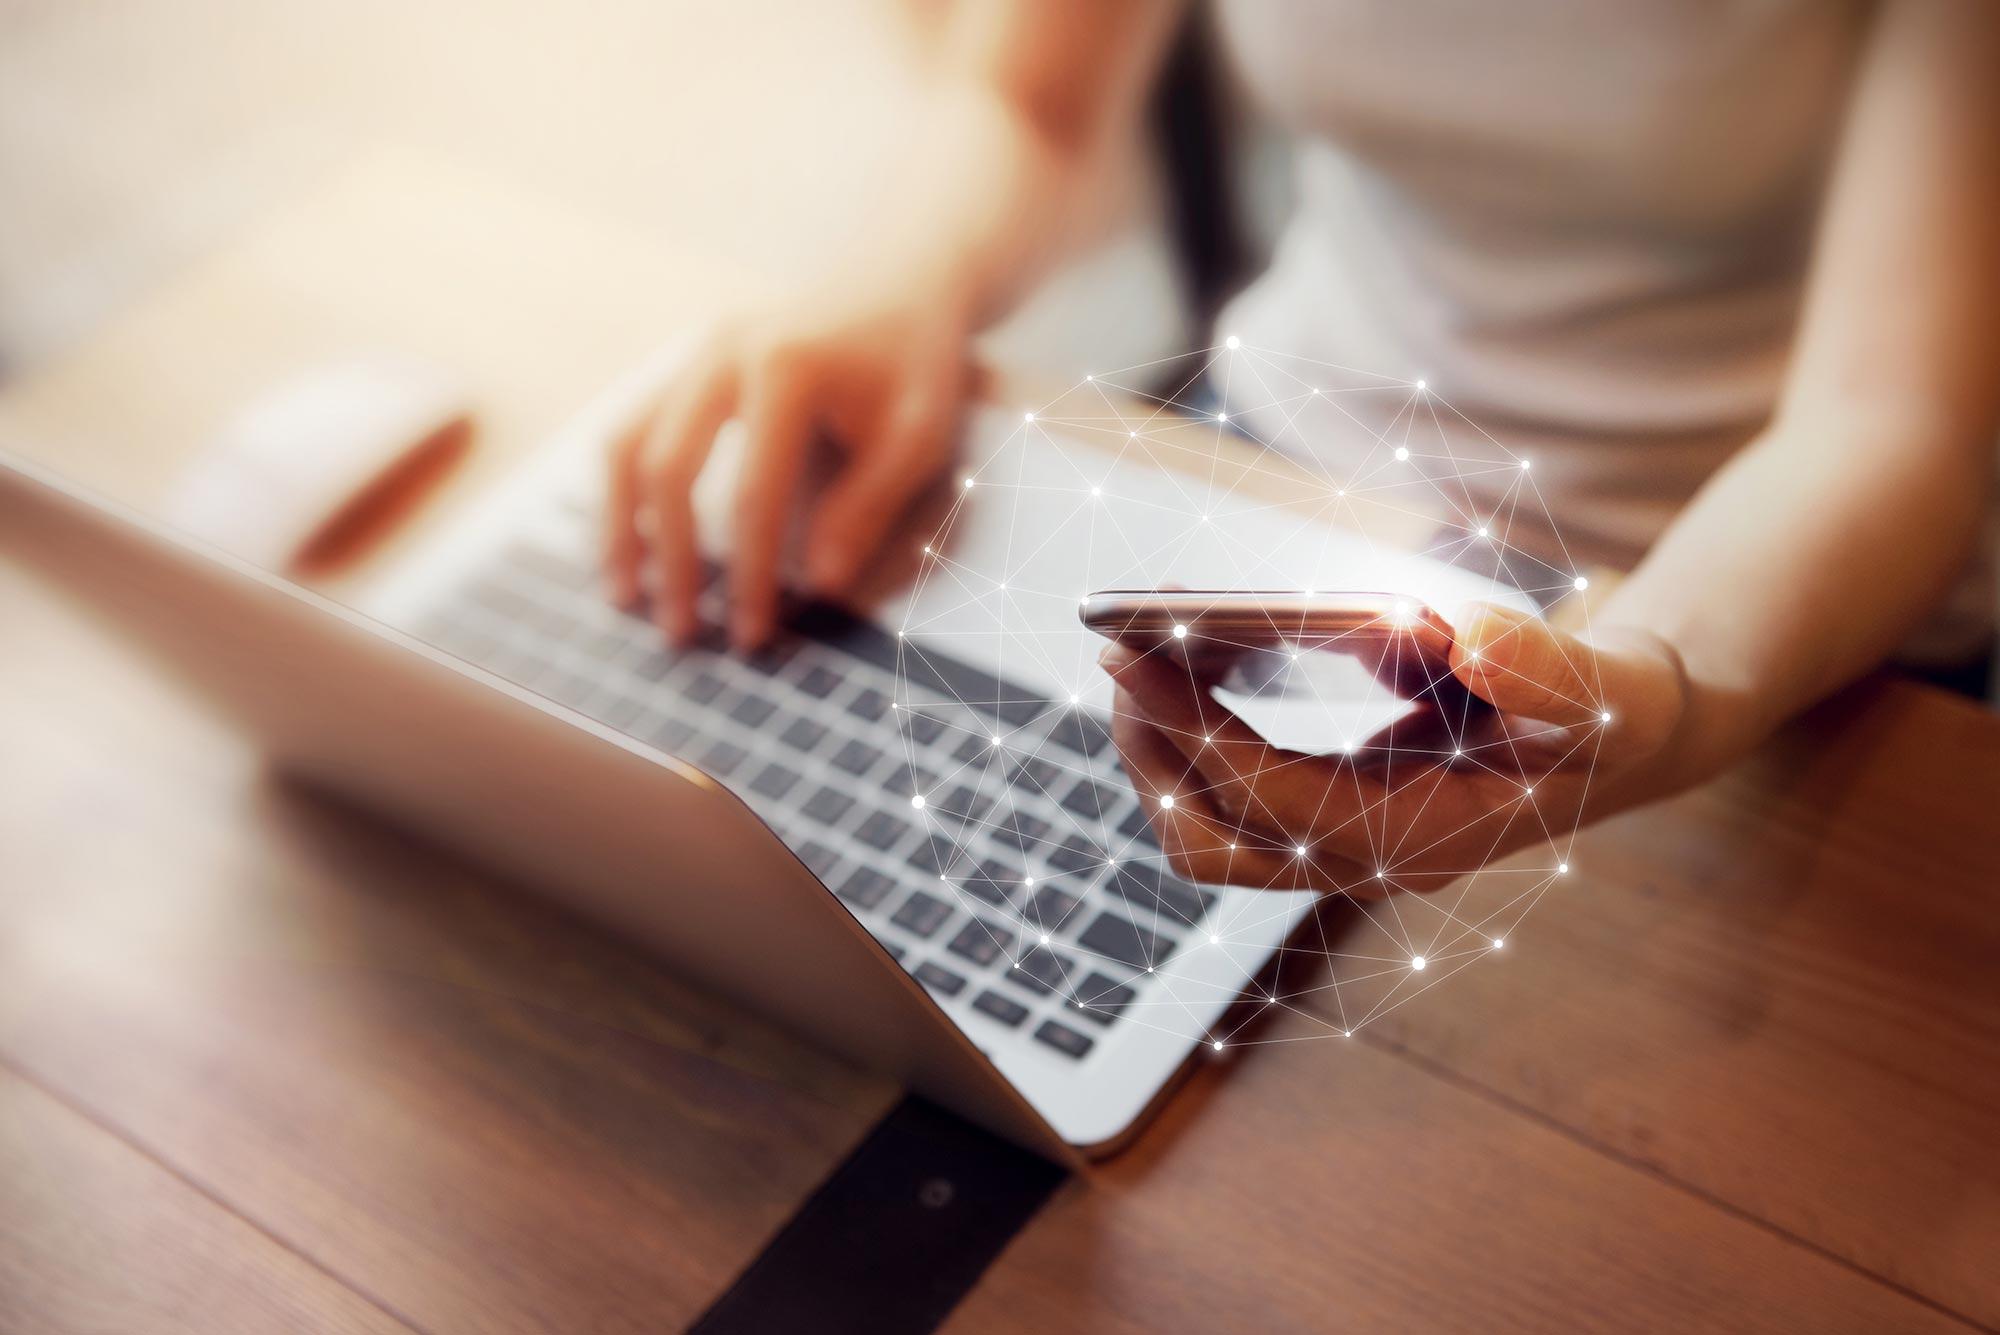 woman-holding-smartphone-using-laptop-connectivity.jpg